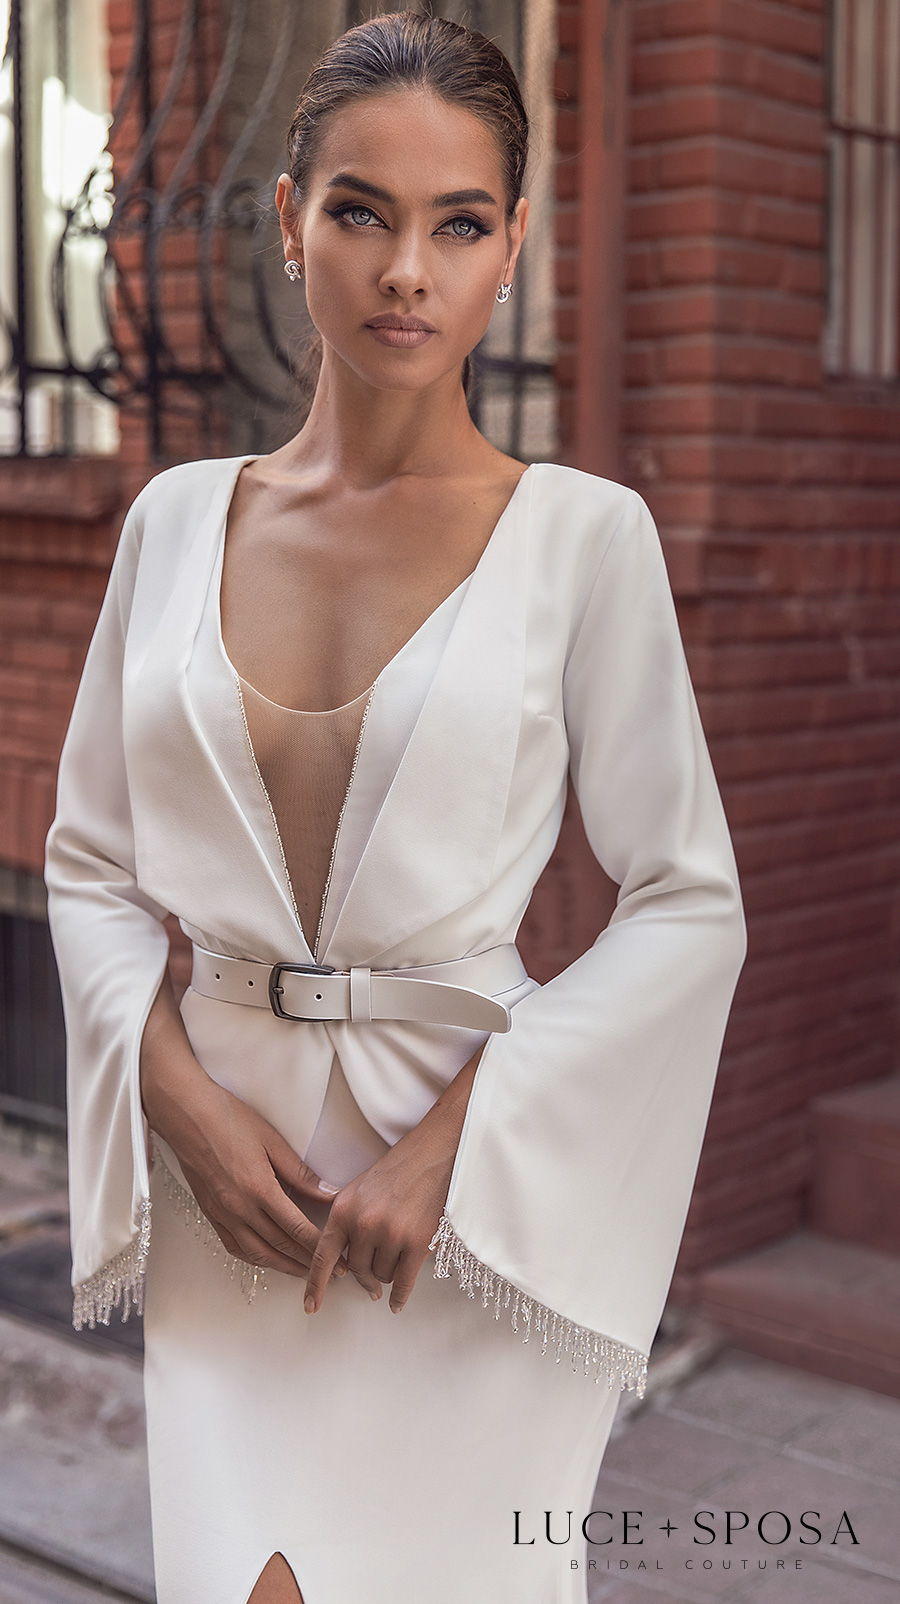 luce sposa s2021 istanbul bridal sleeveless deep v neck simple minimalist slit skirt elegant sheath wedding dress low v back chapel train (royalty) zv